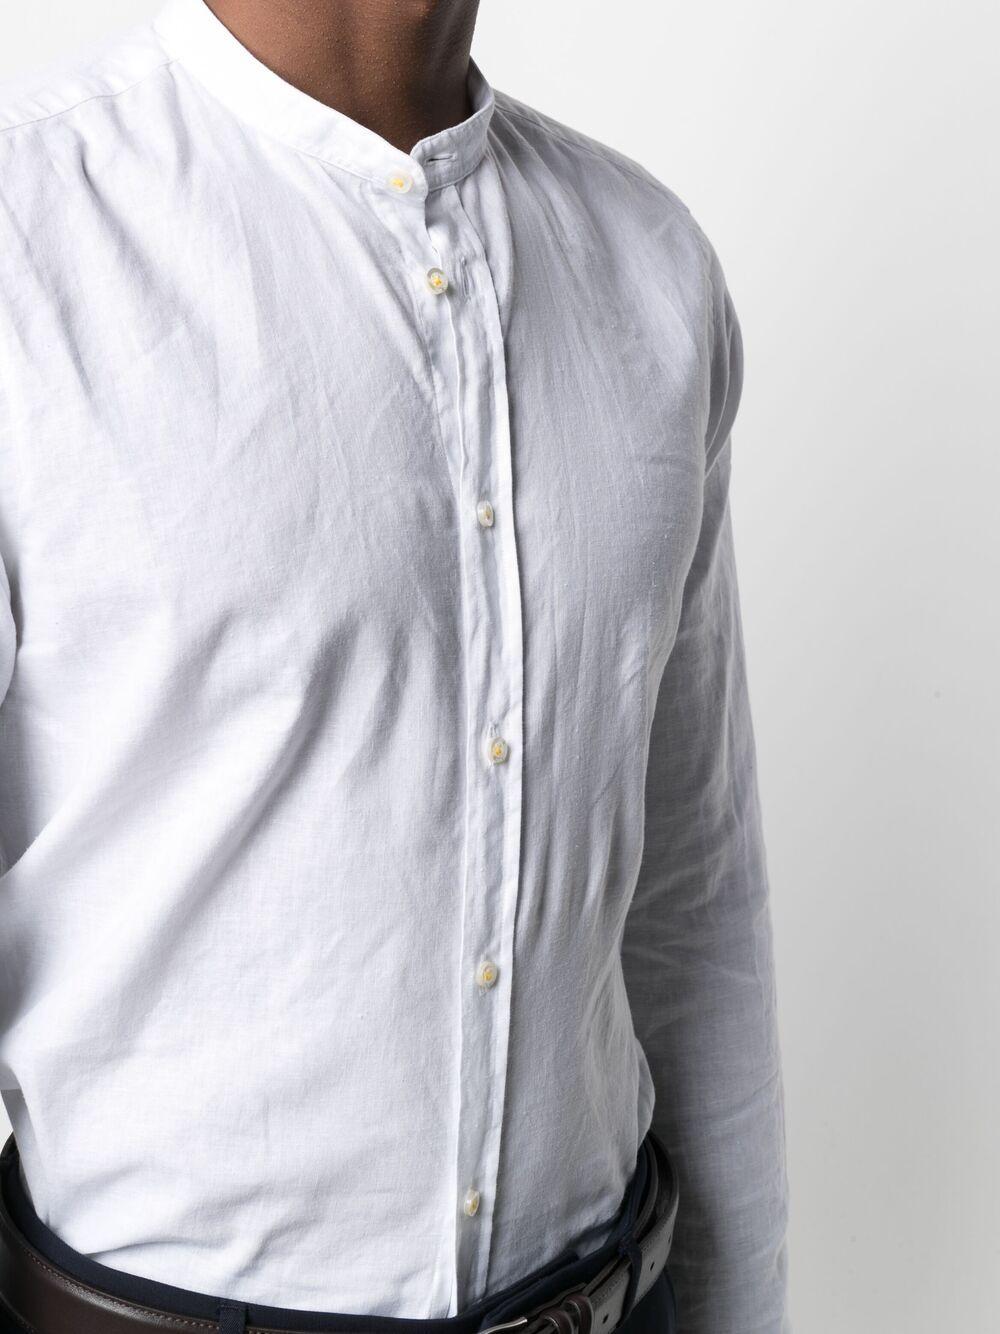 White cotton and linen shirt featuring band collar MANUEL RITZ |  | 3032E604L-21323702